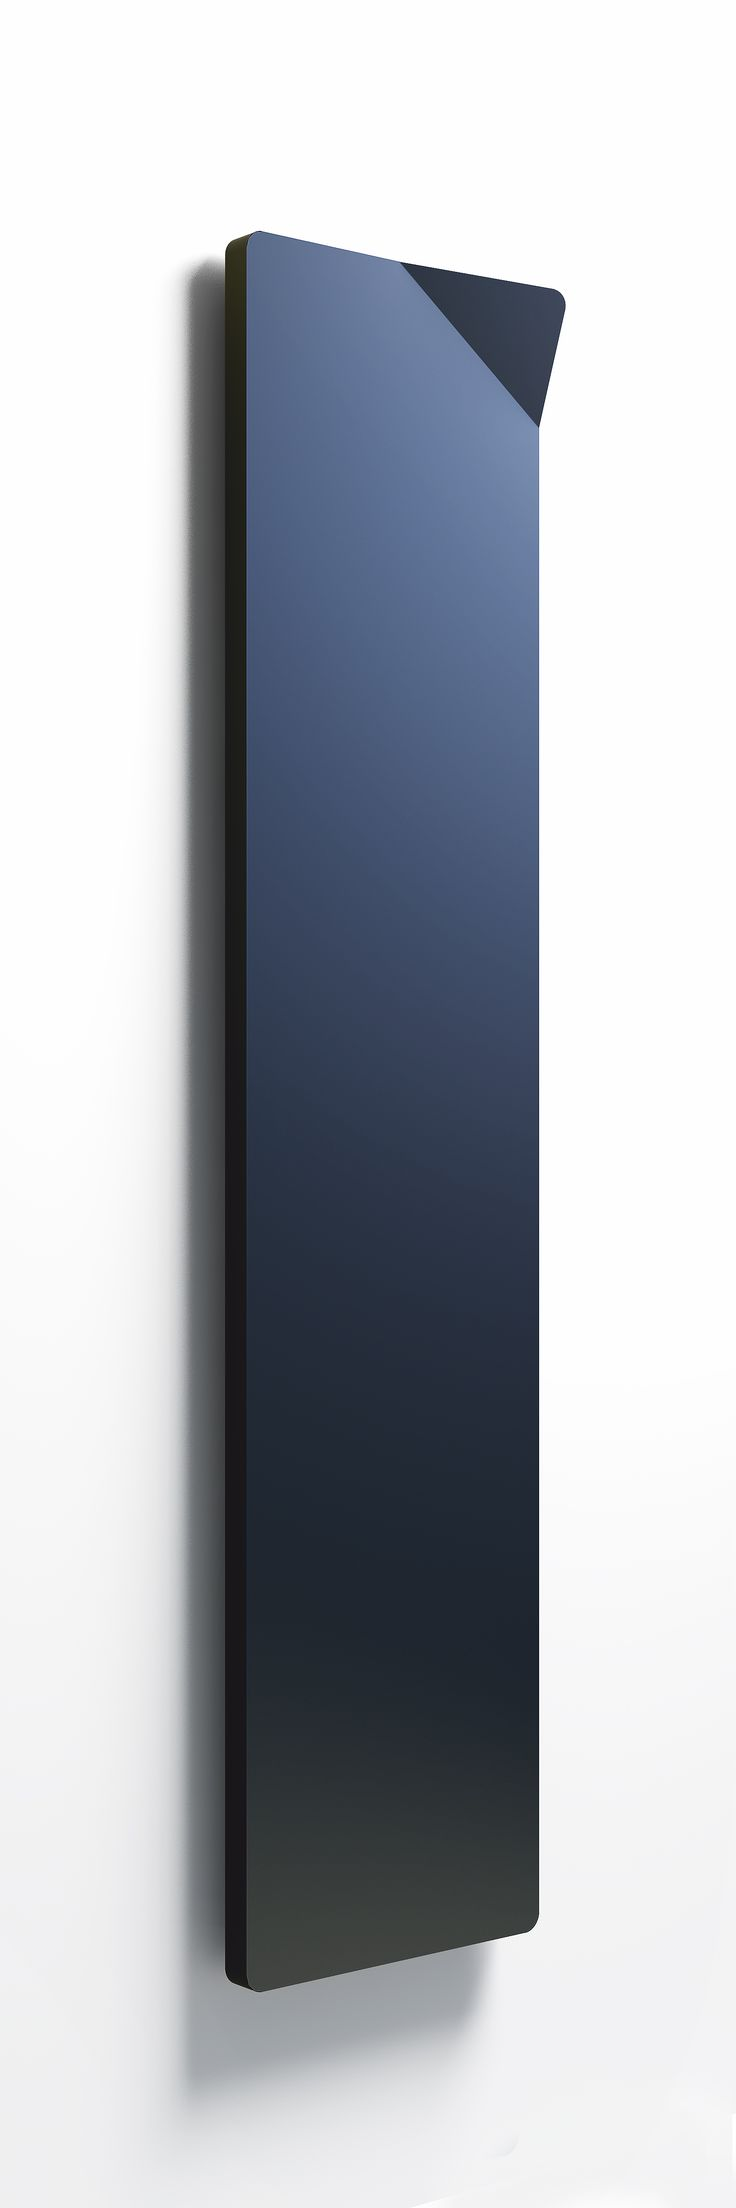 Oltre 1000 idee su radiateur vertical su pinterest for Radiateur mural vertical